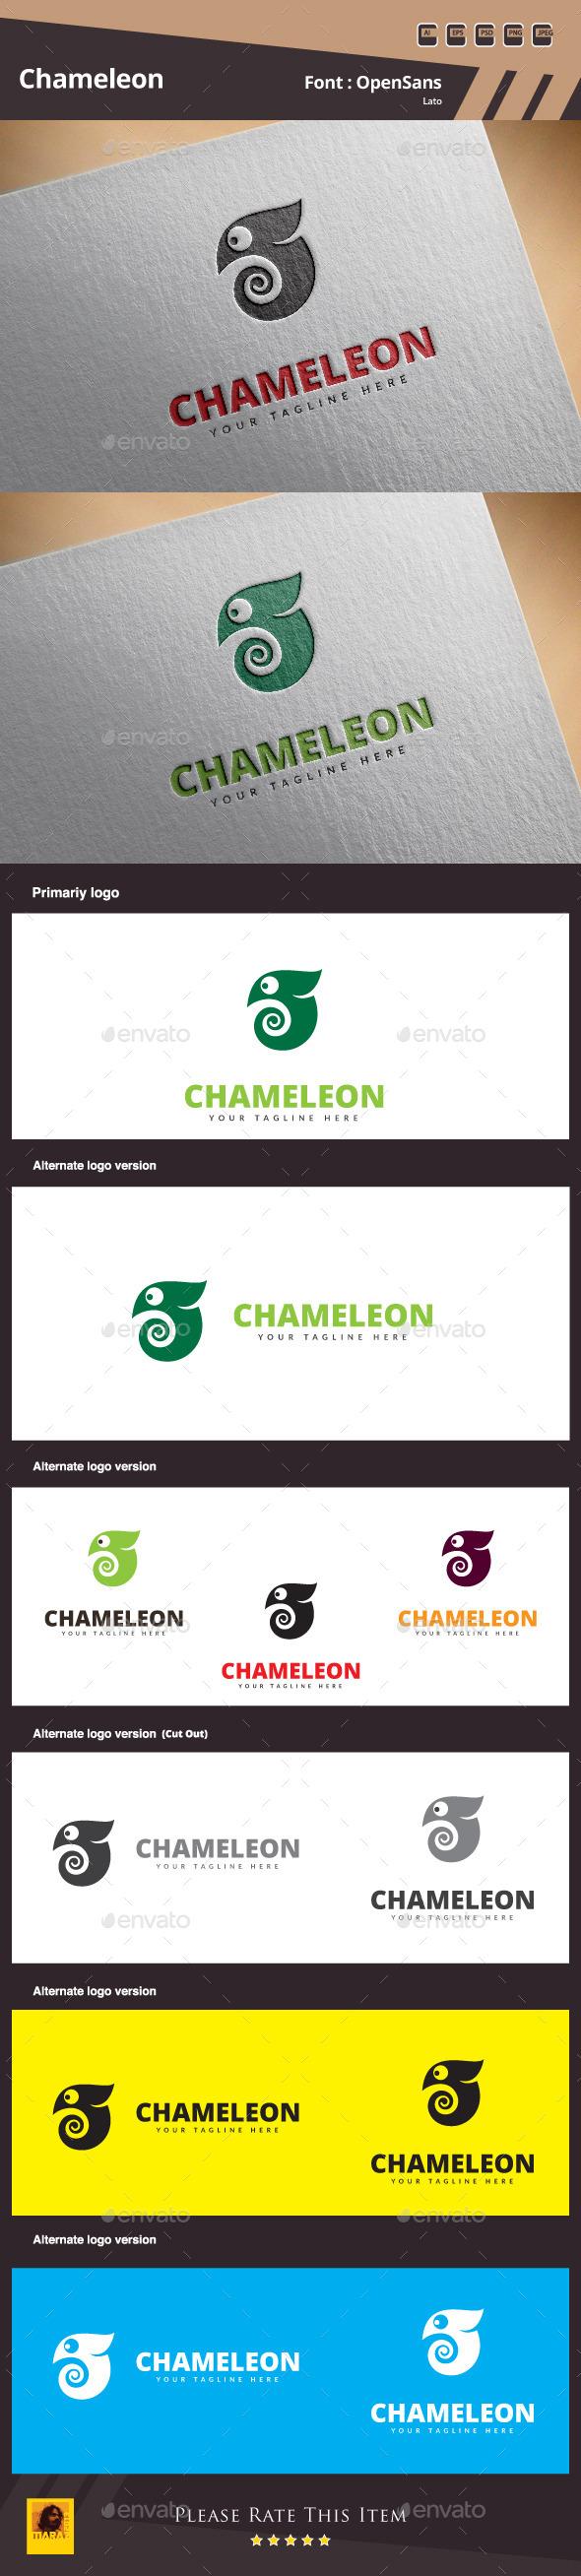 GraphicRiver Chameleon Logo Template 11030807